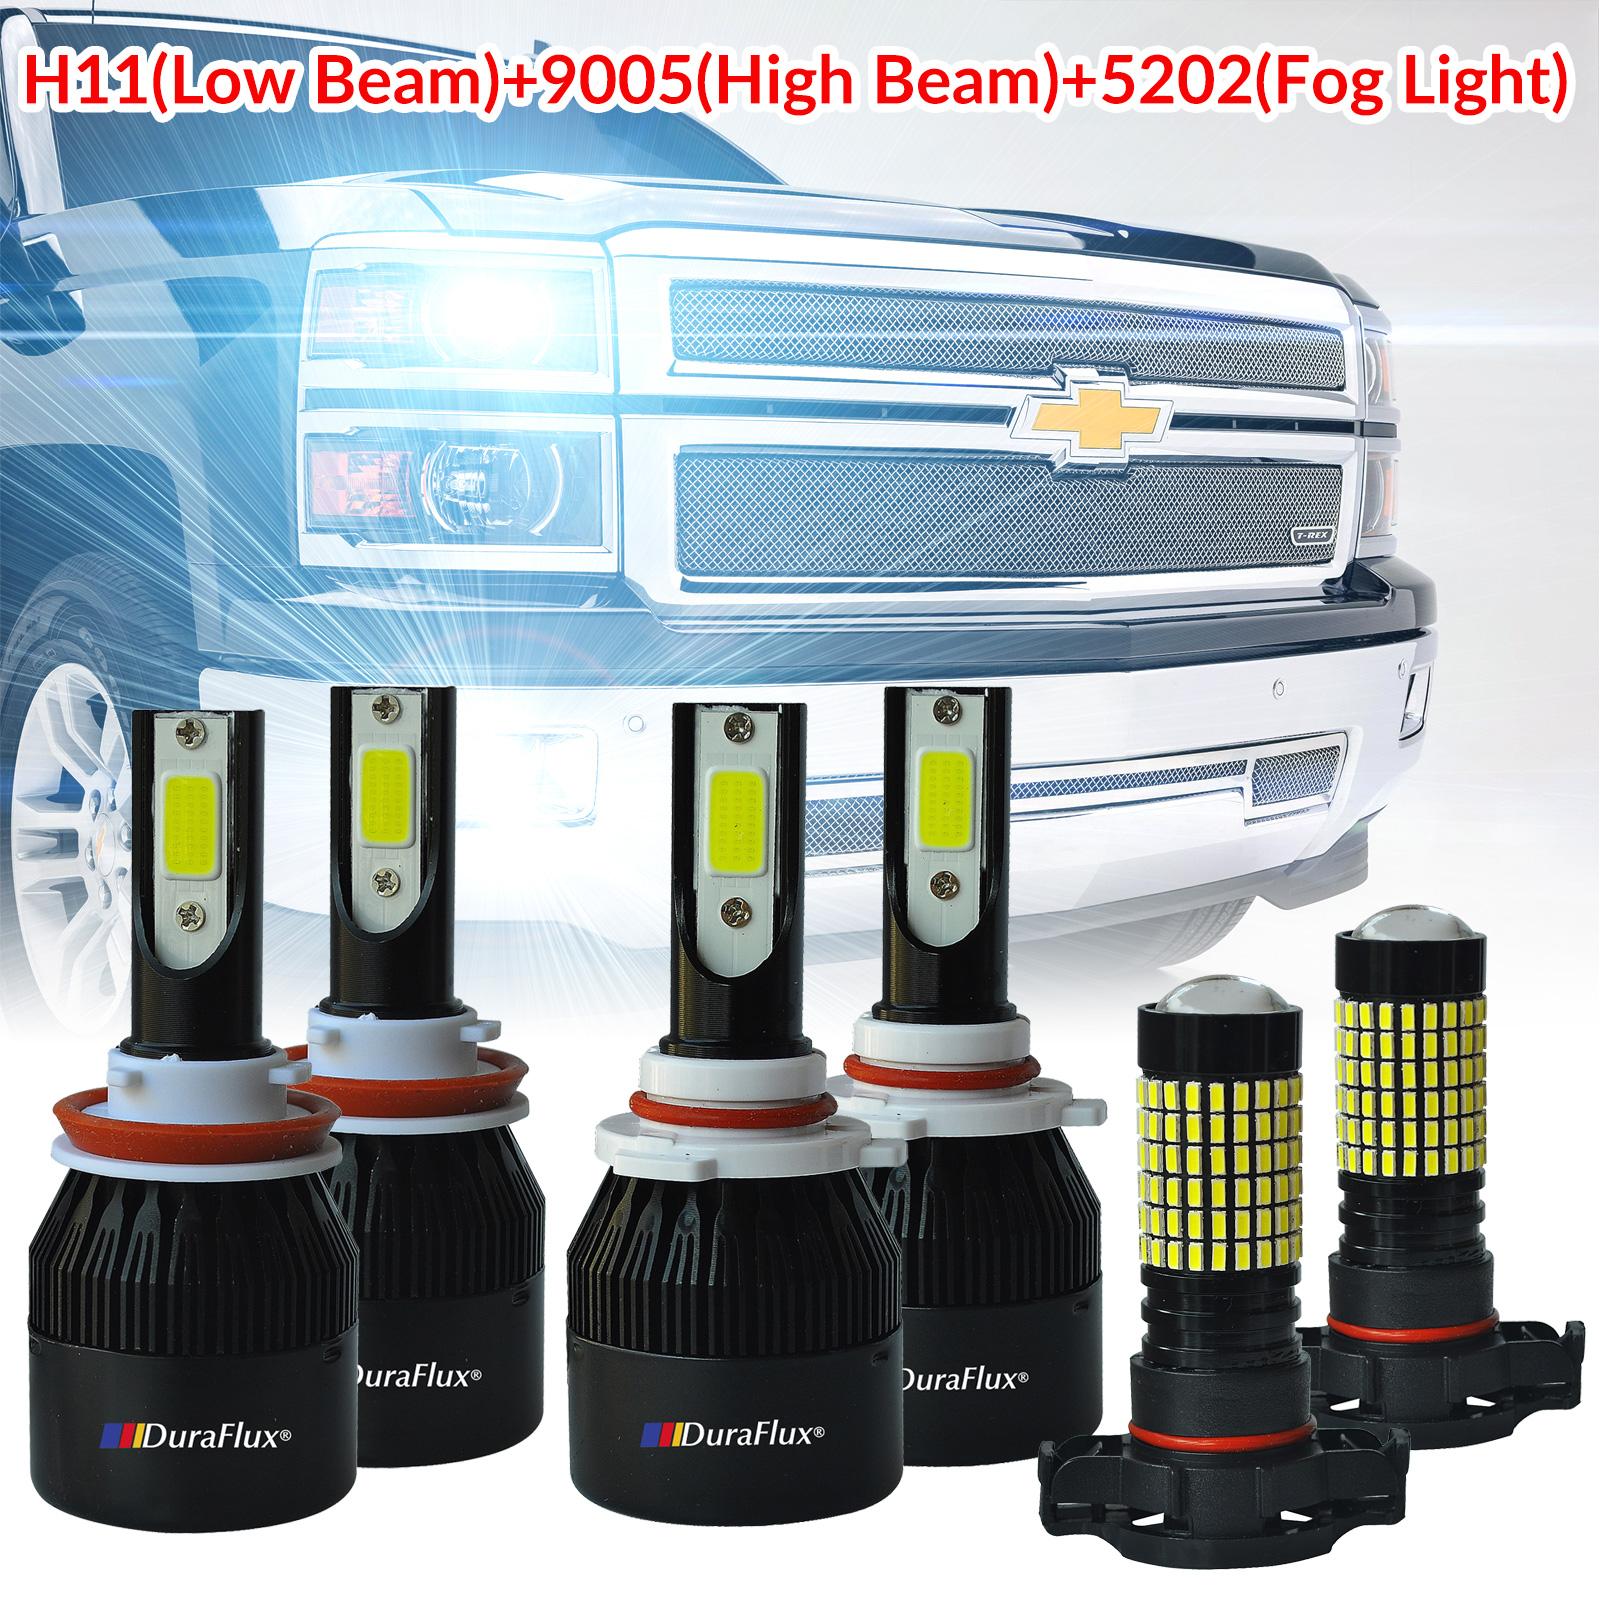 Duraflux H11 9005 Led Headlight 5202 Fog Light Fo 2007 2015 Chevy Silverado Lights 1500